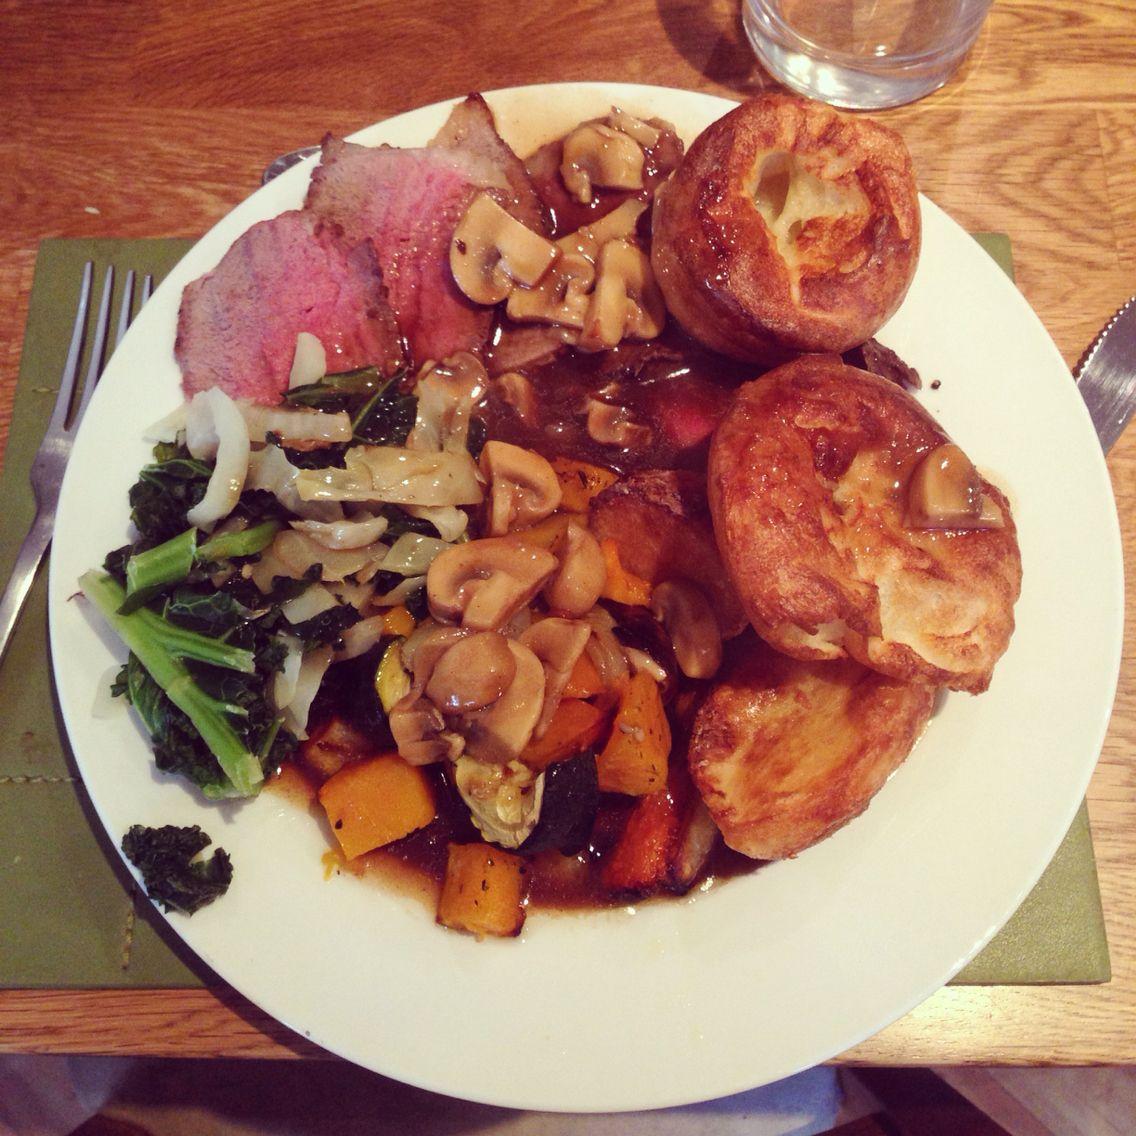 Donnas done it again.. Sunday roast tingz